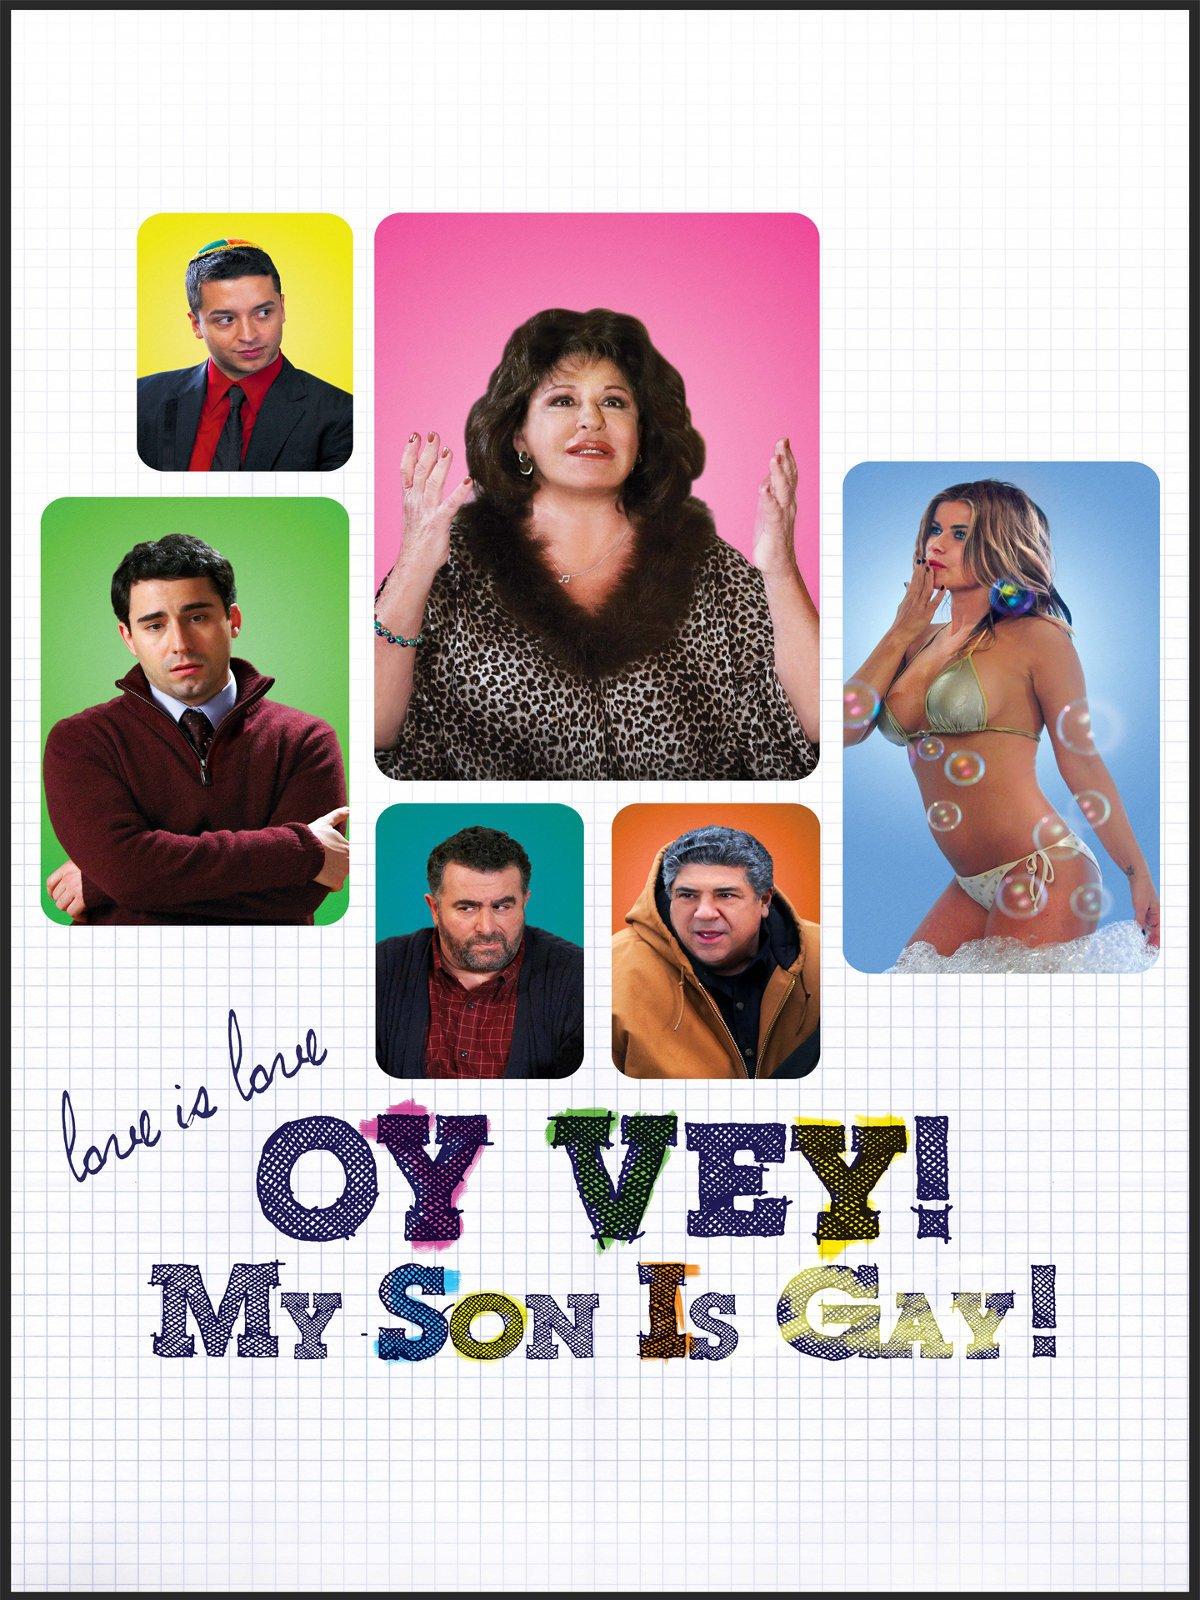 Oy Vey! My Son Is Gay! (2009) Hindi Dual Audio 720p HDRip 900MB ESubs